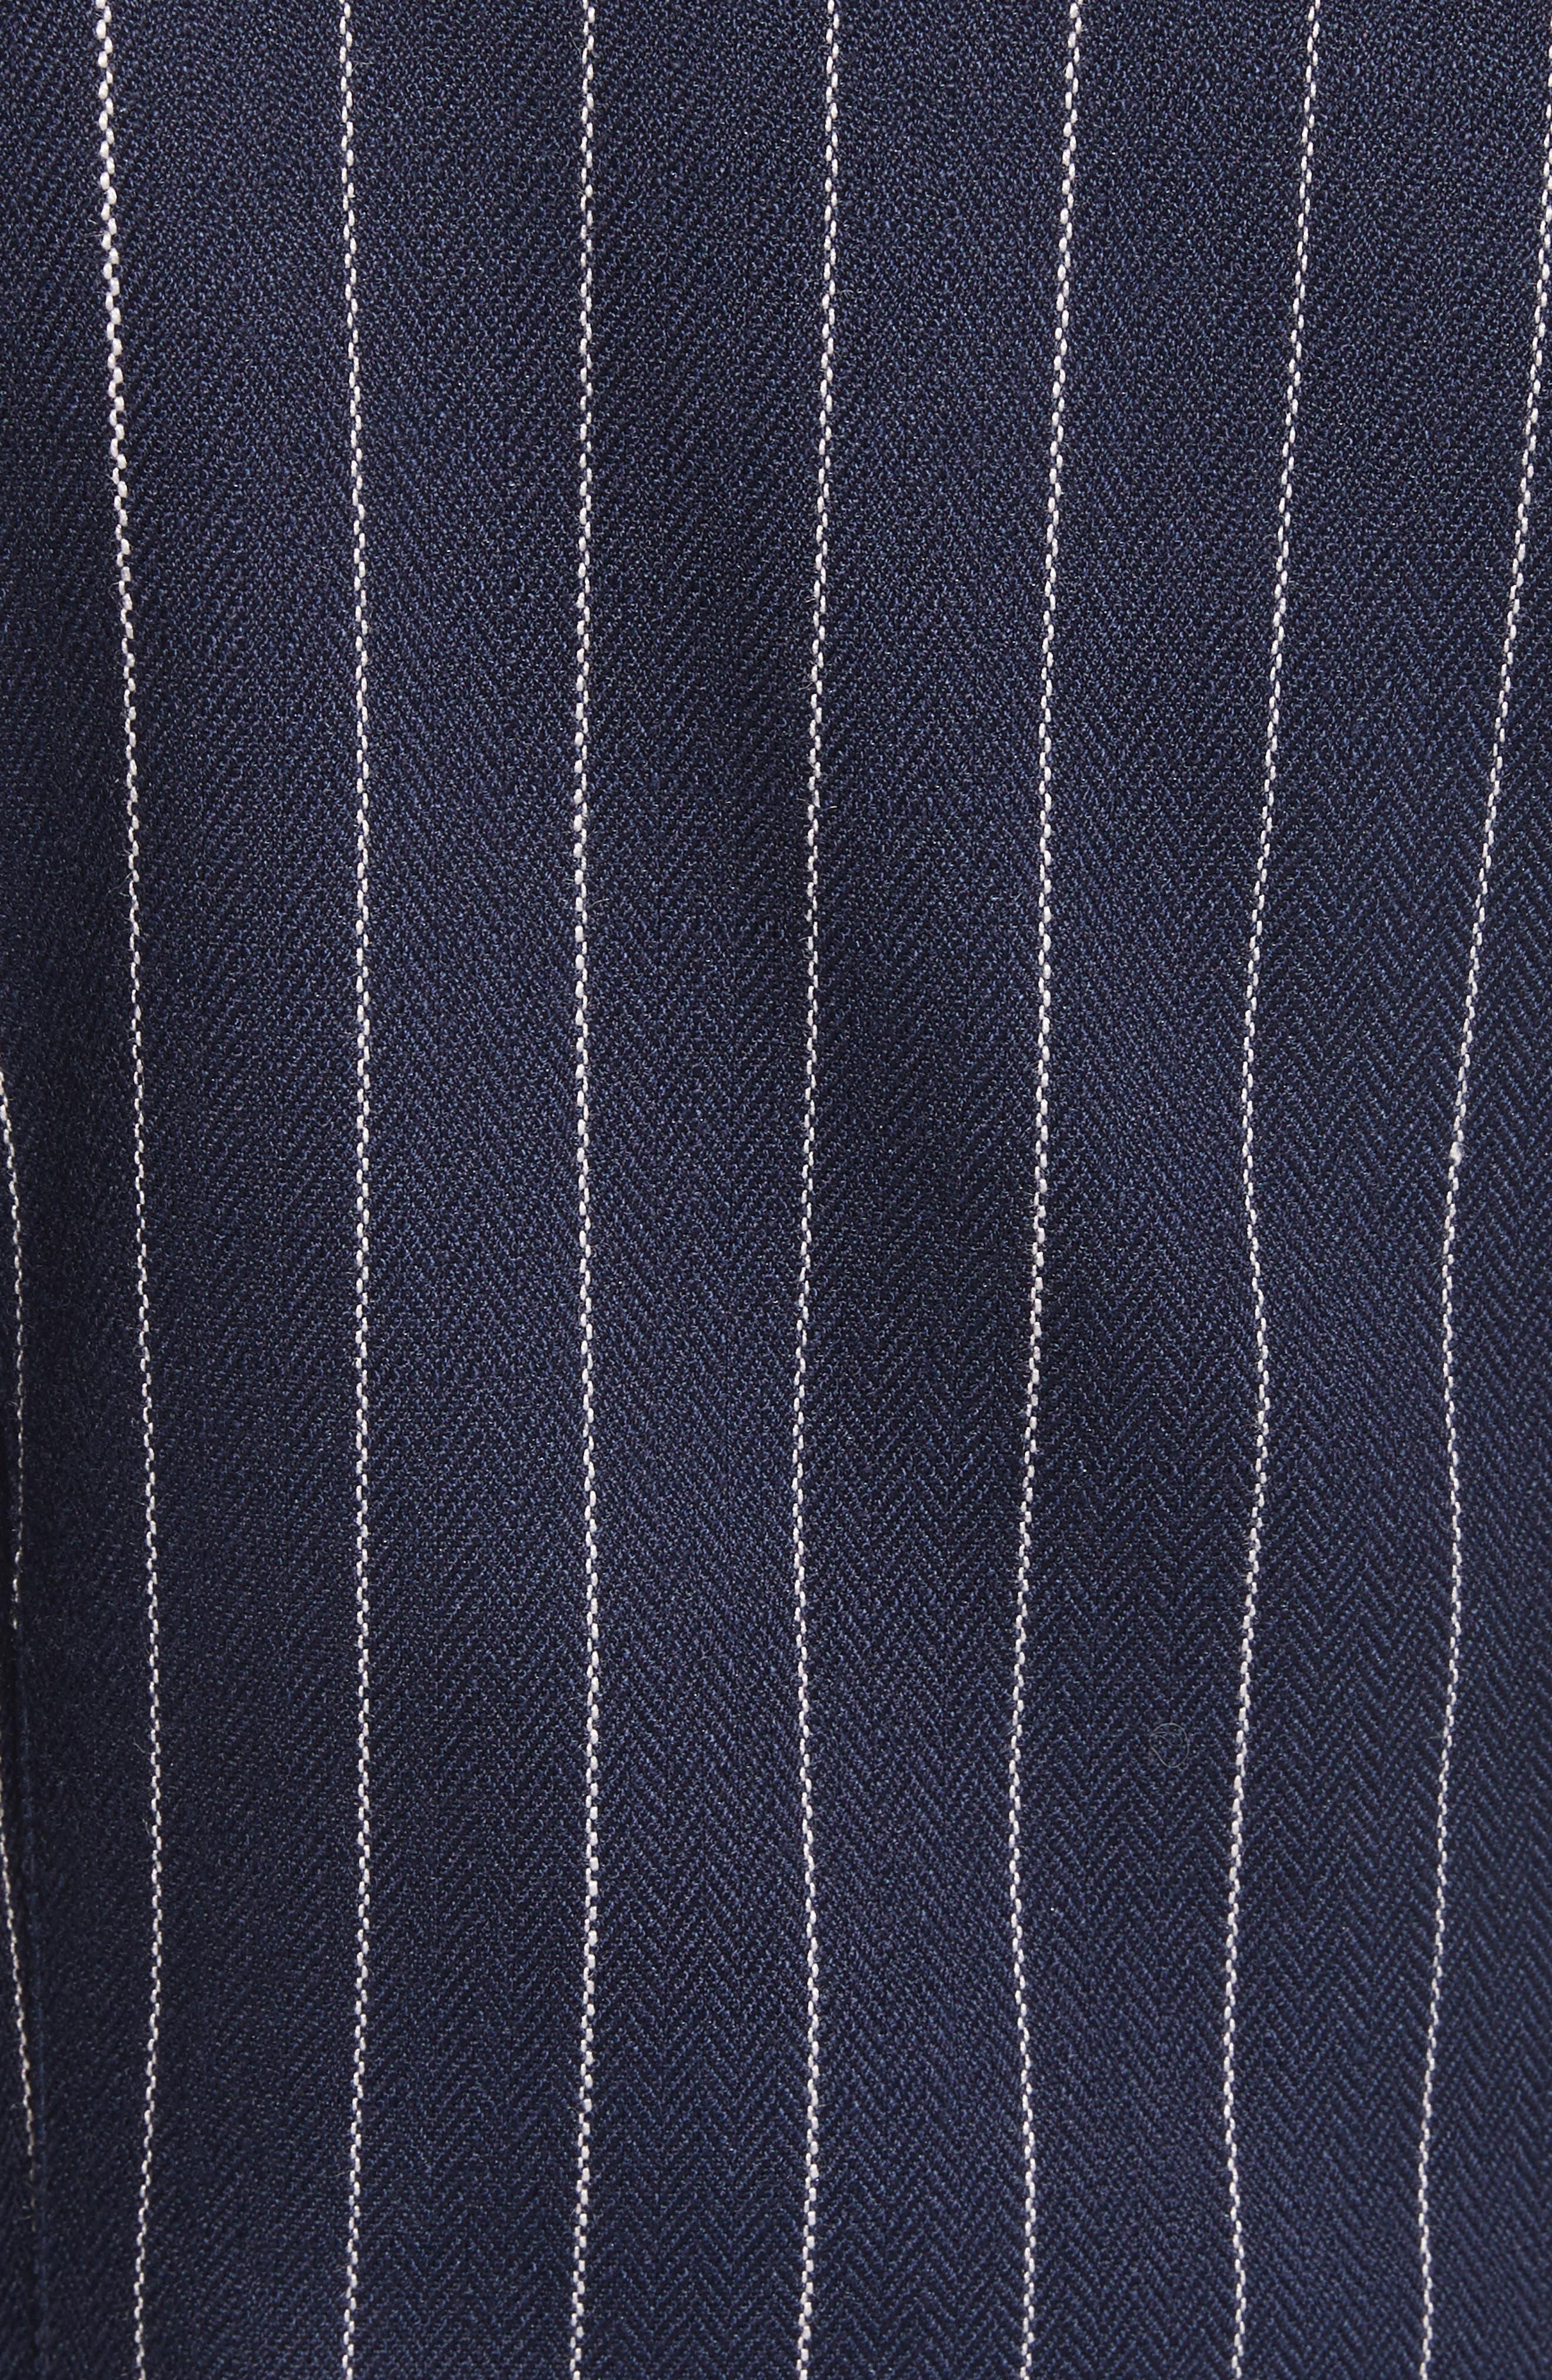 Stripe Puff Sleeve Blazer,                             Alternate thumbnail 5, color,                             Navy Pinstripe